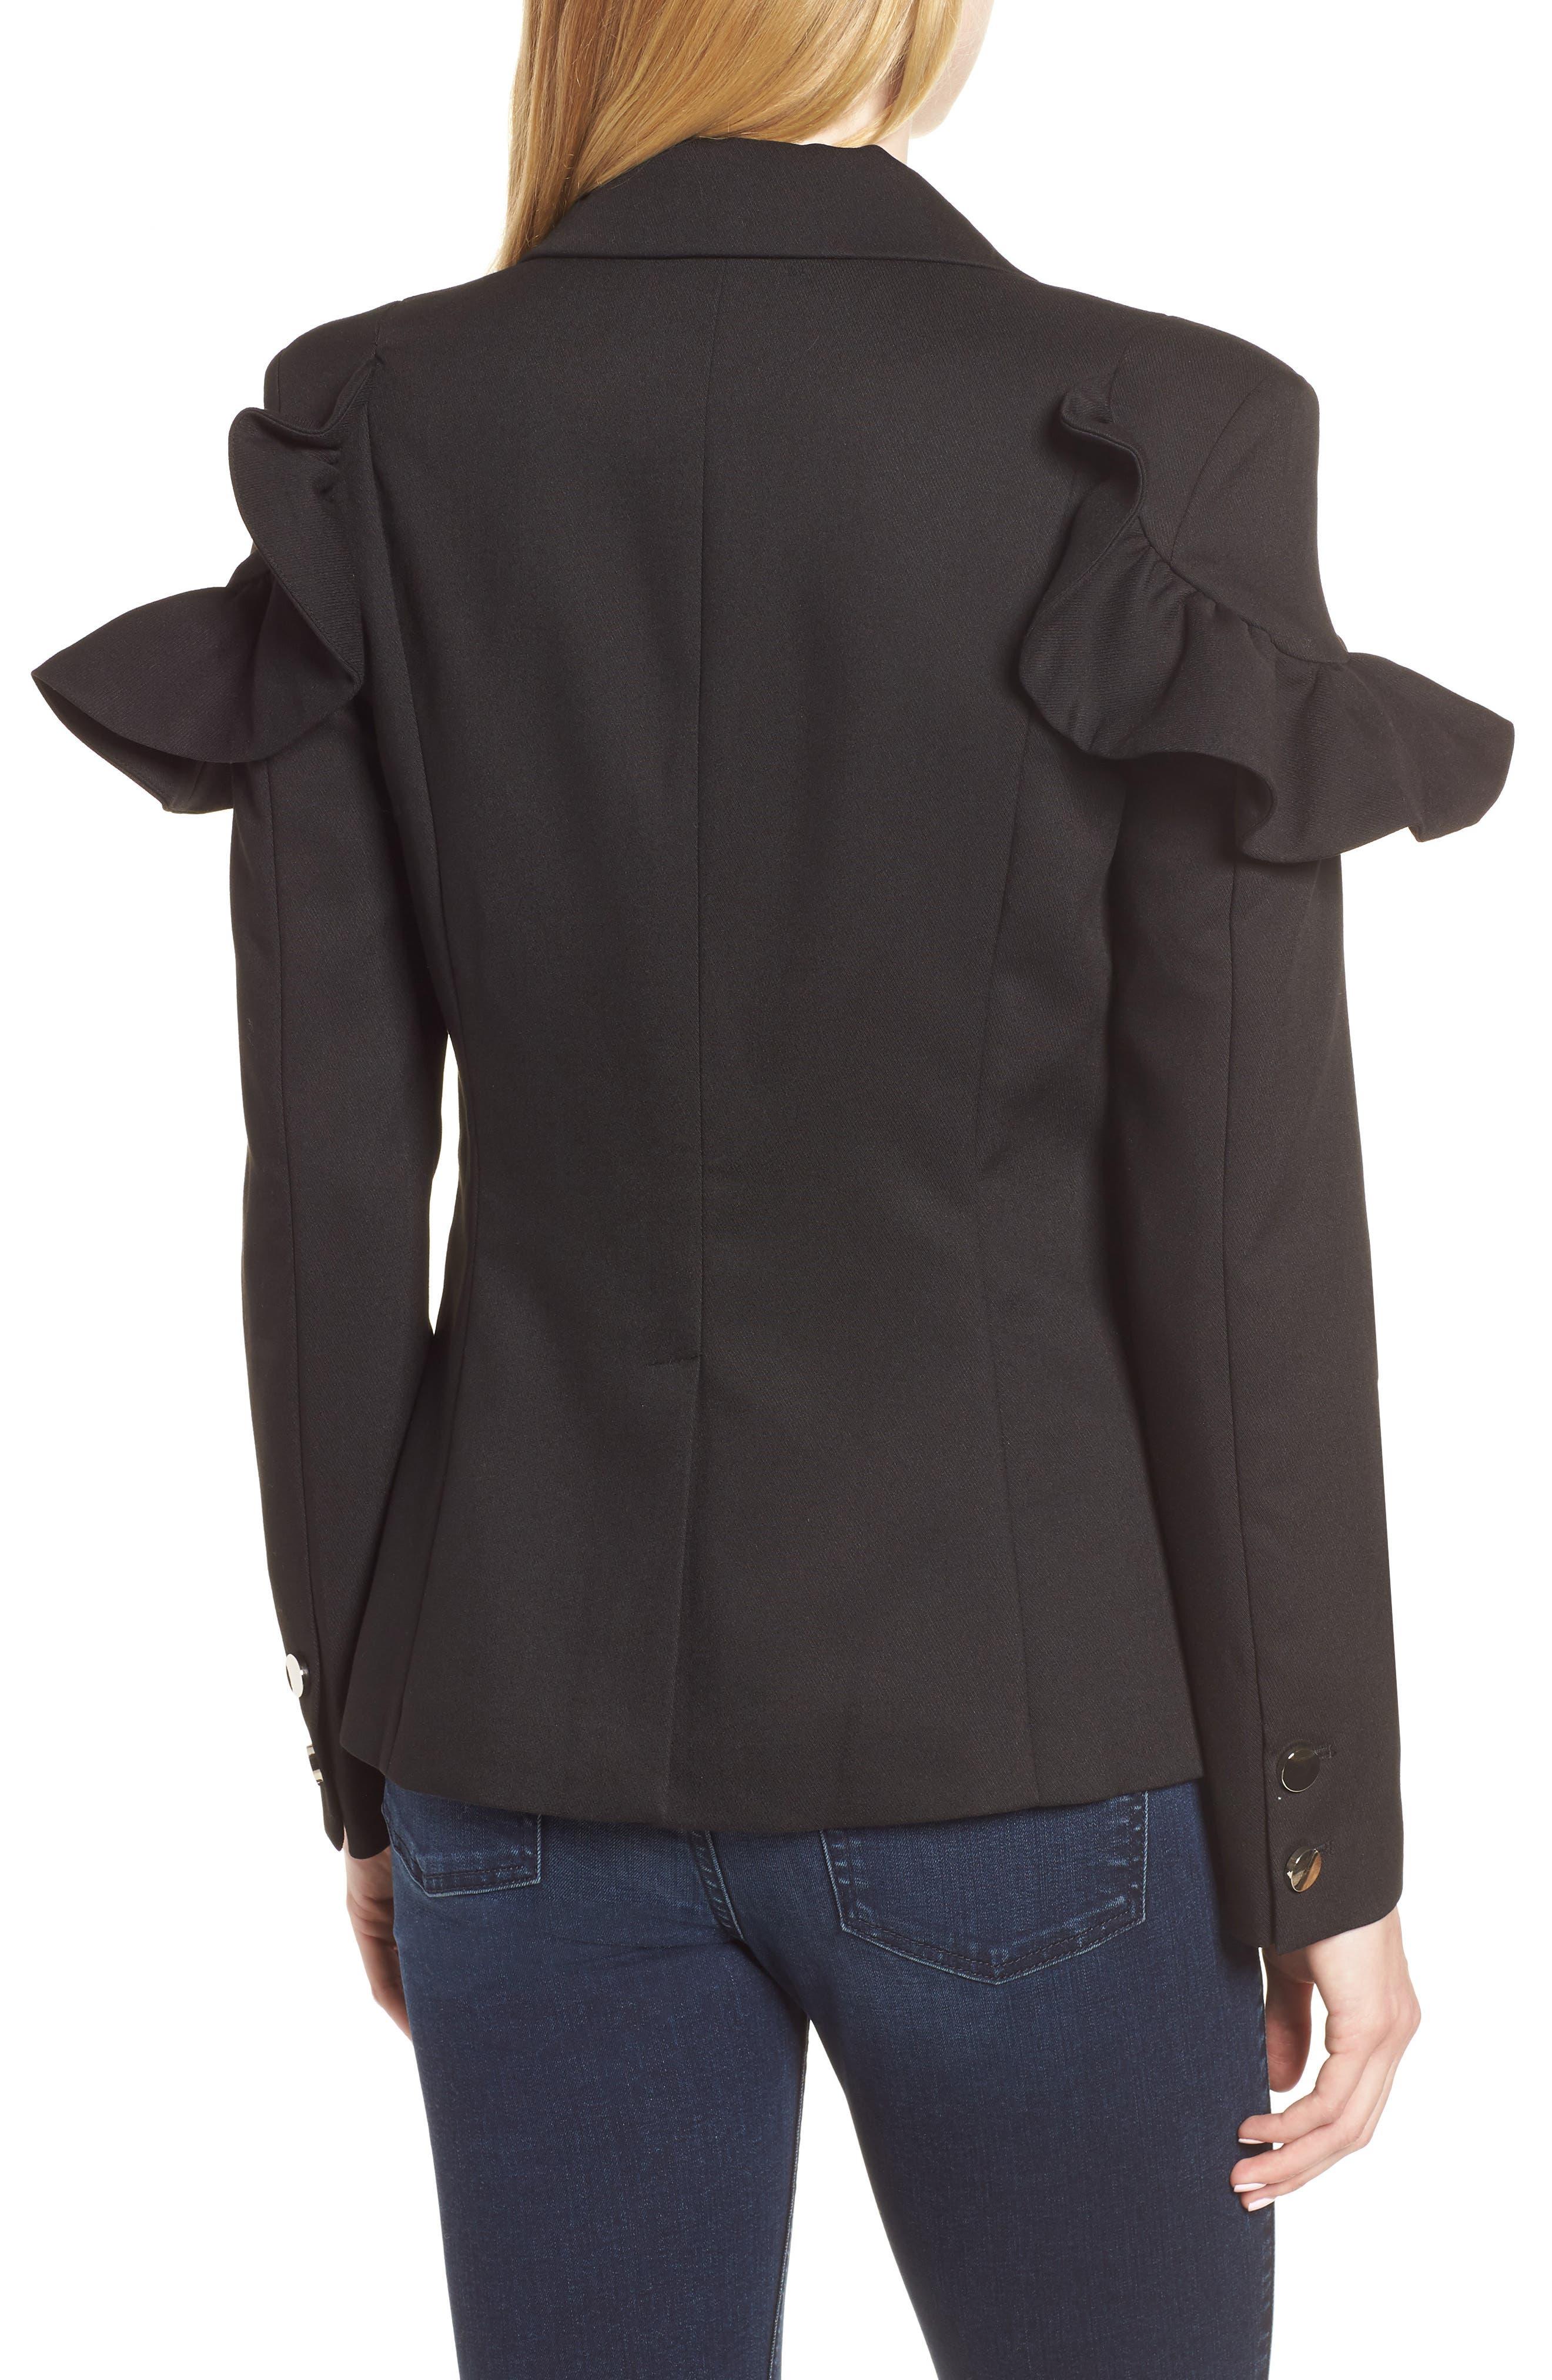 Harmony Jacket,                             Alternate thumbnail 2, color,                             Black